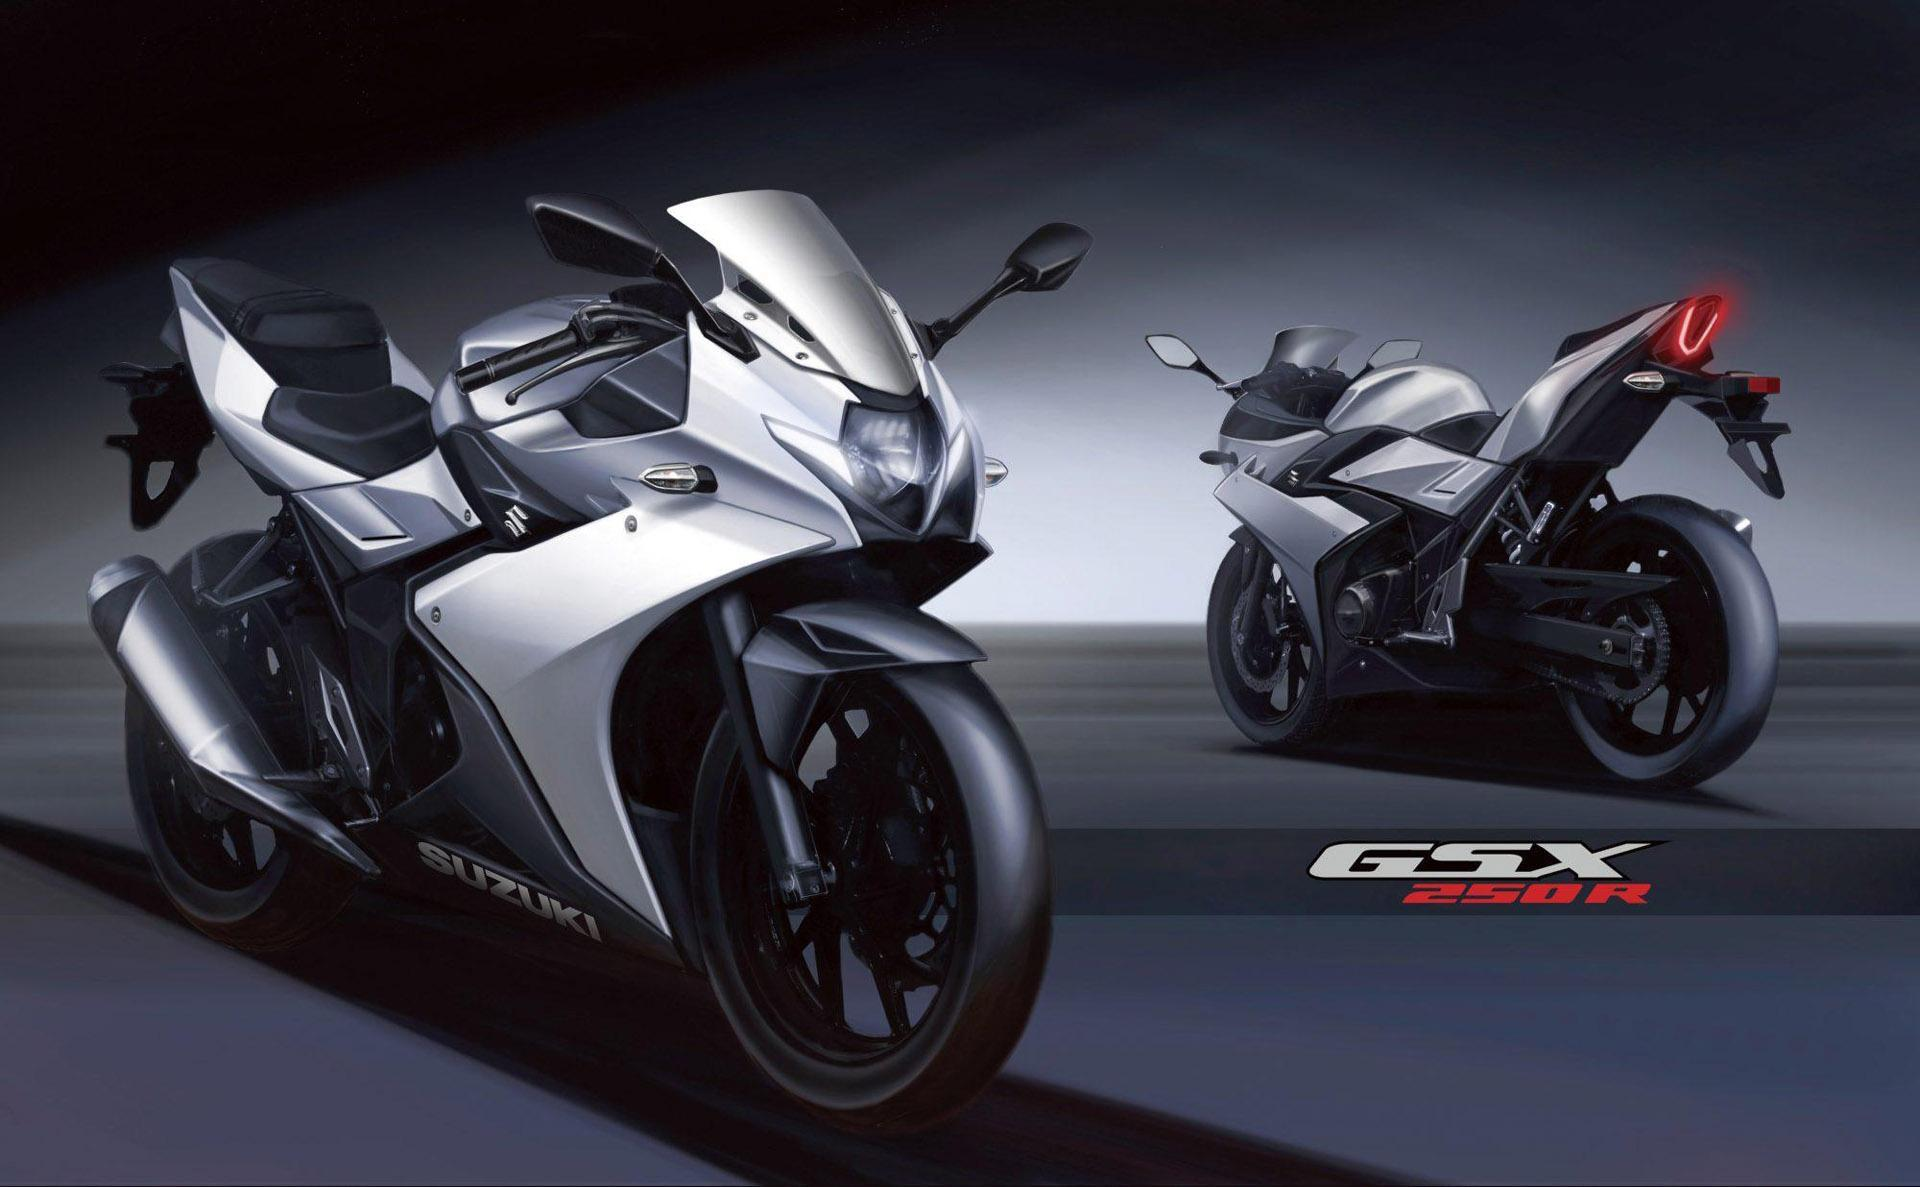 GSX-250R Design